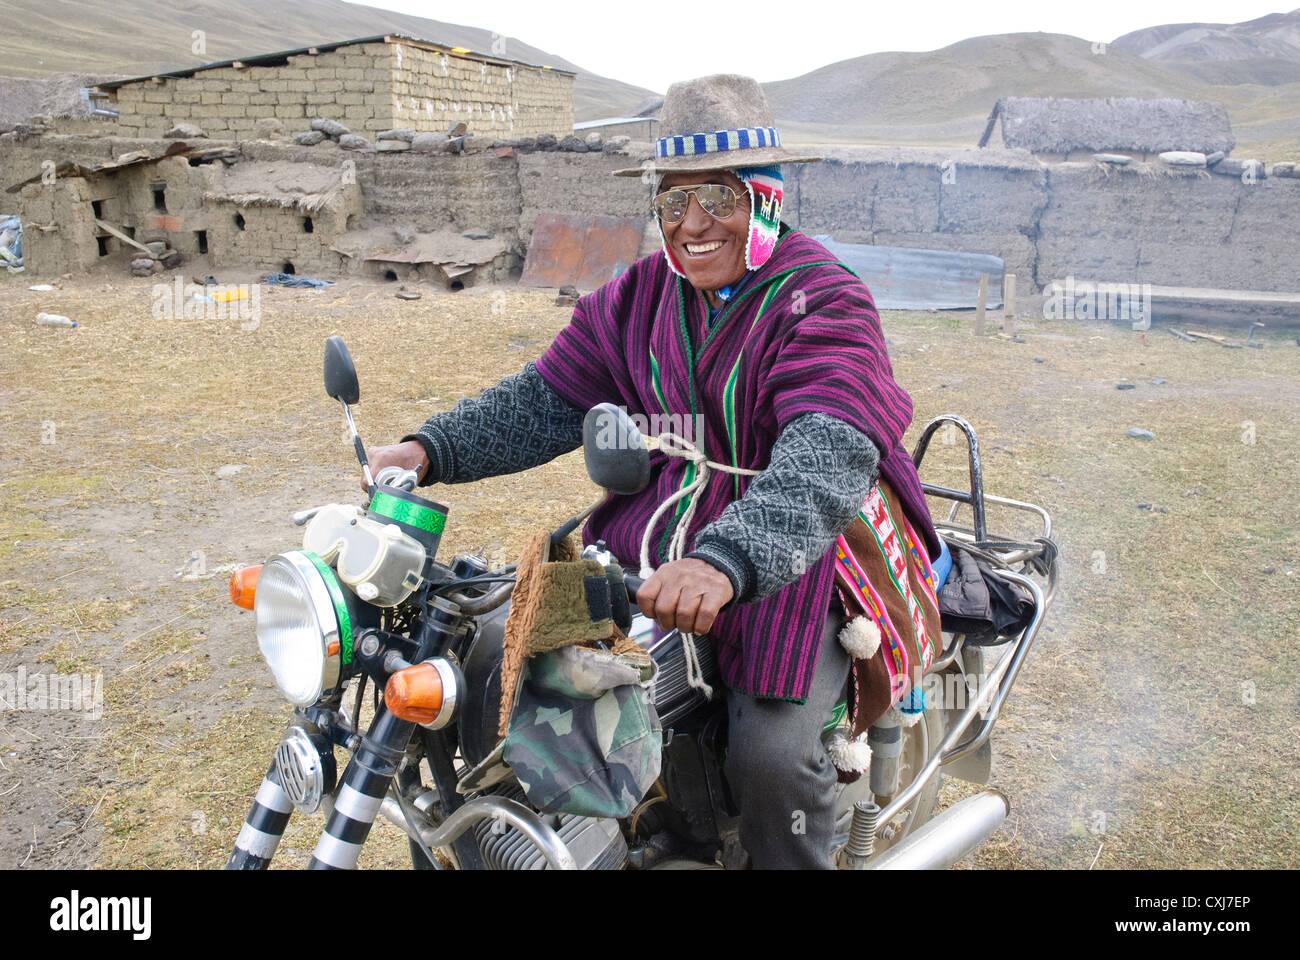 Aymara biker in the Cordillera - Stock Image